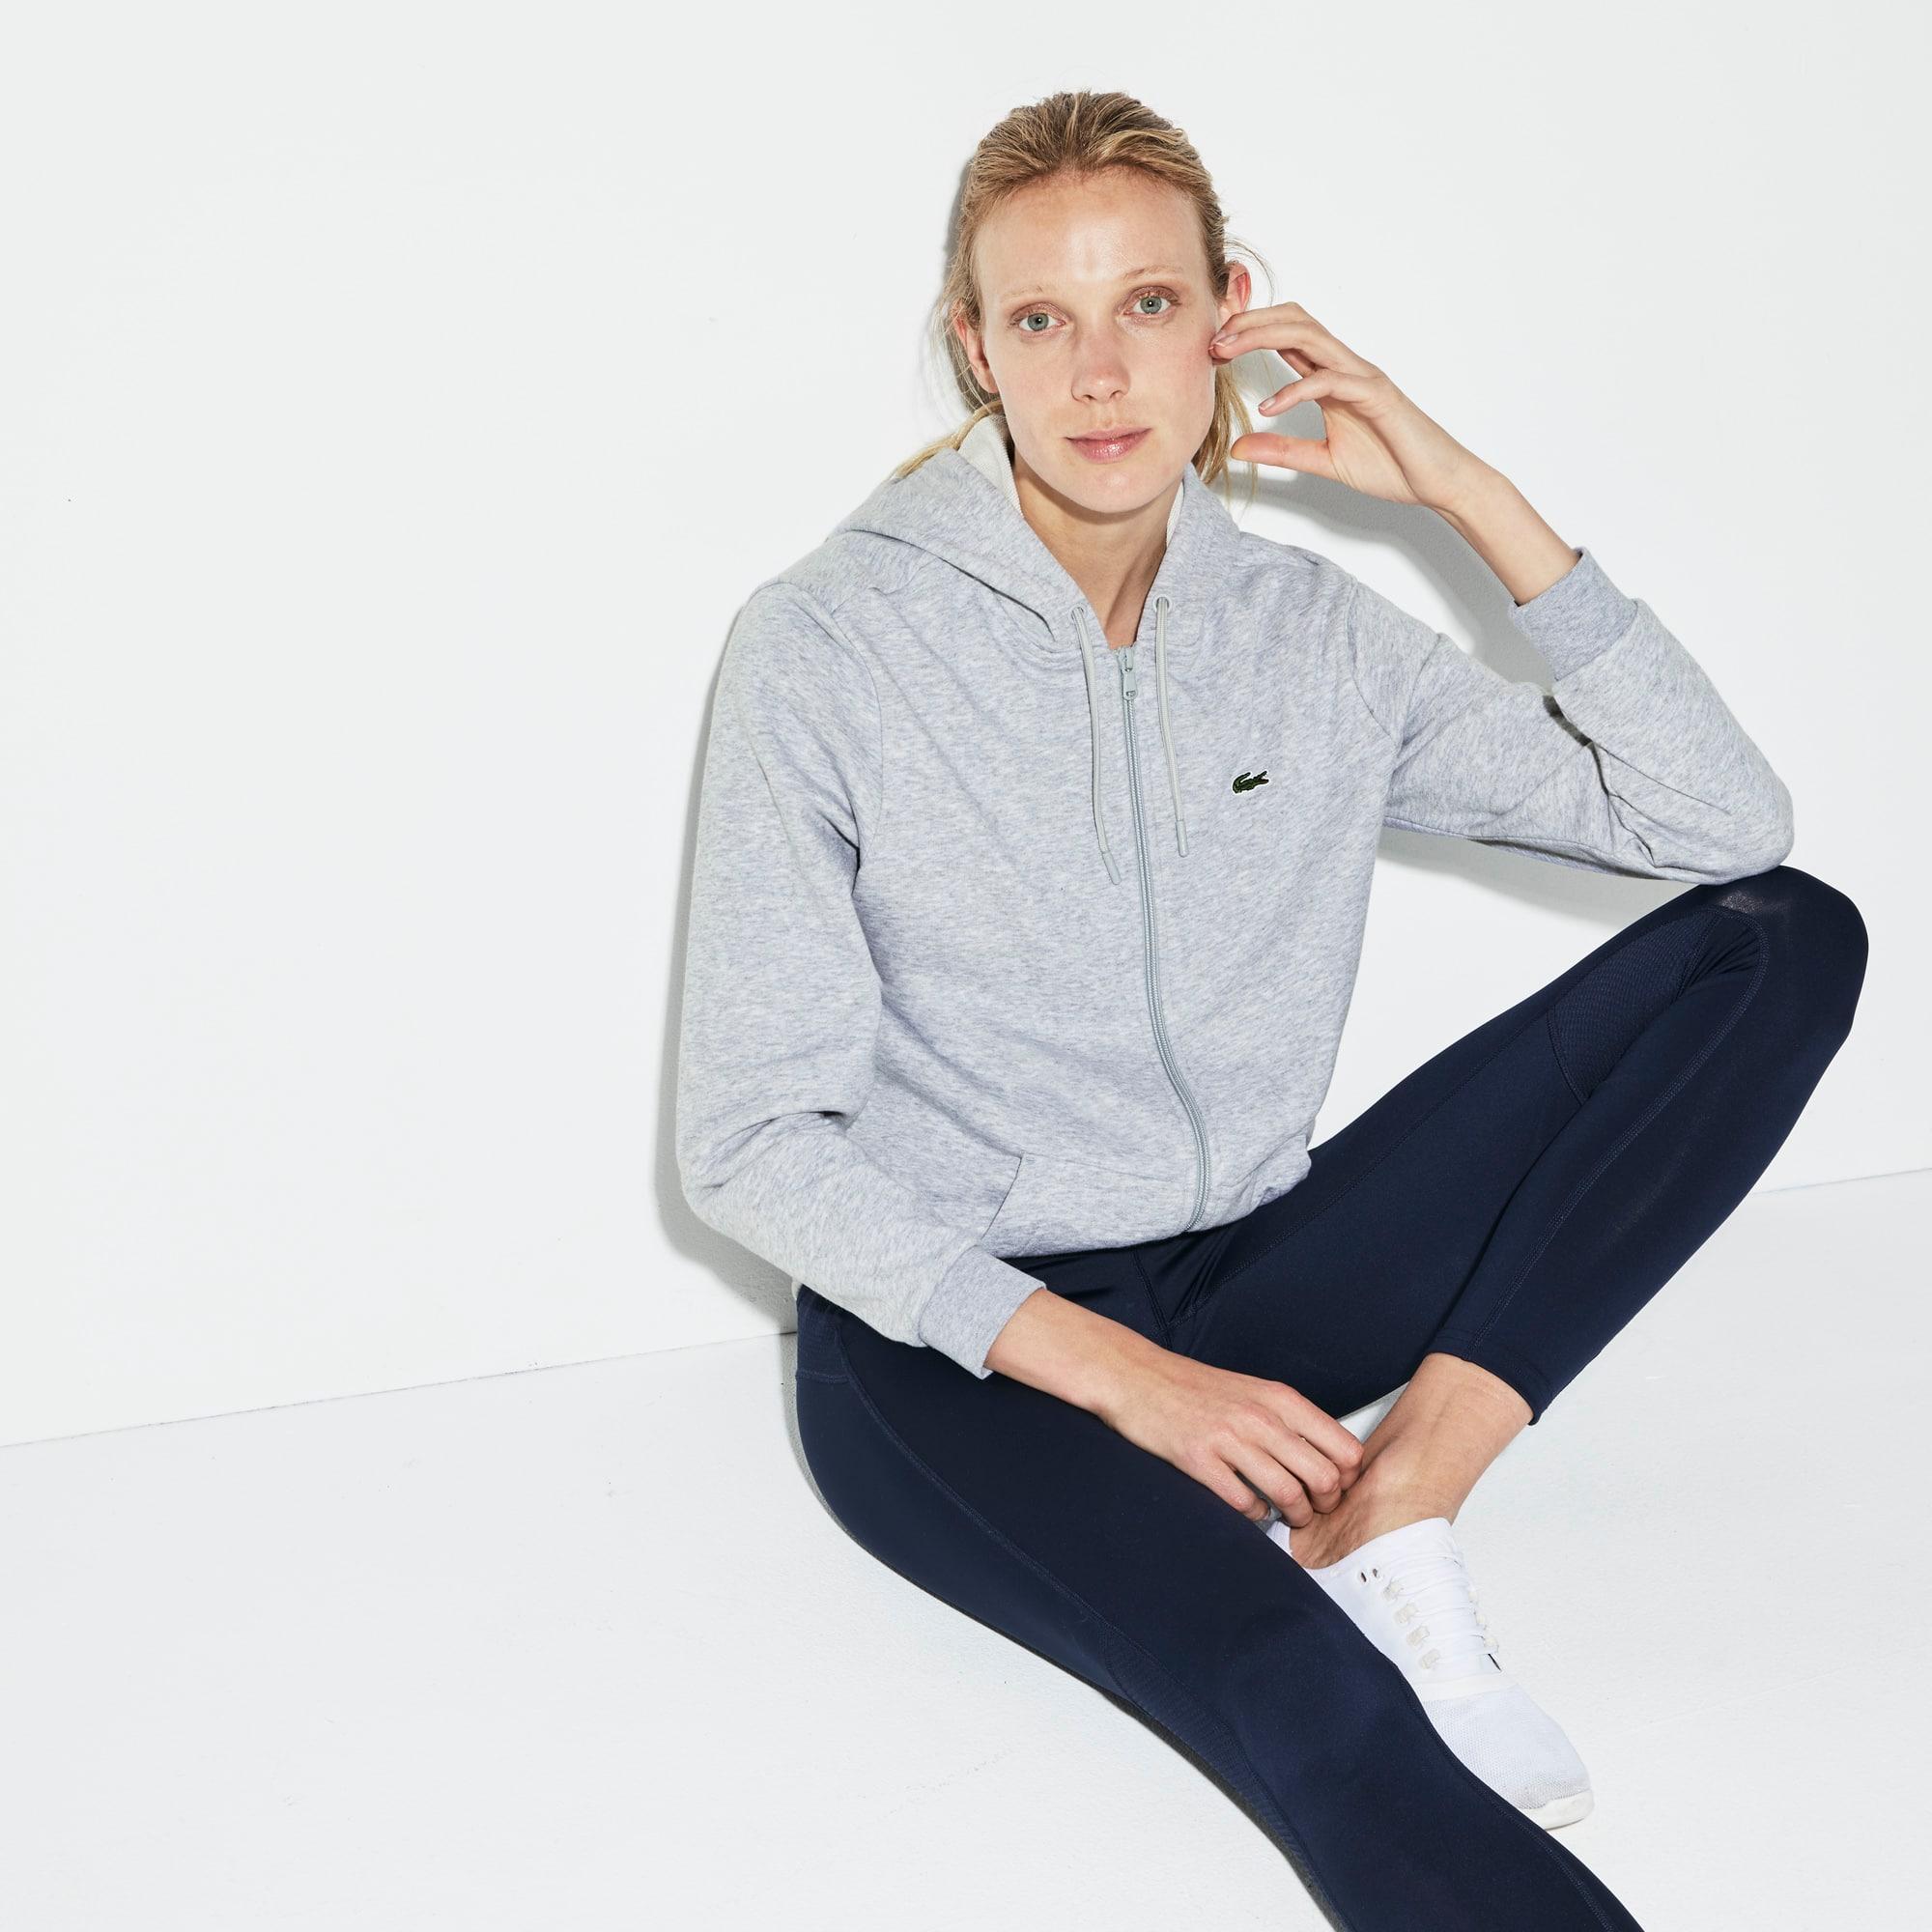 Women's Lacoste SPORT Tennis Hooded Zippered Fleece Sweatshirt